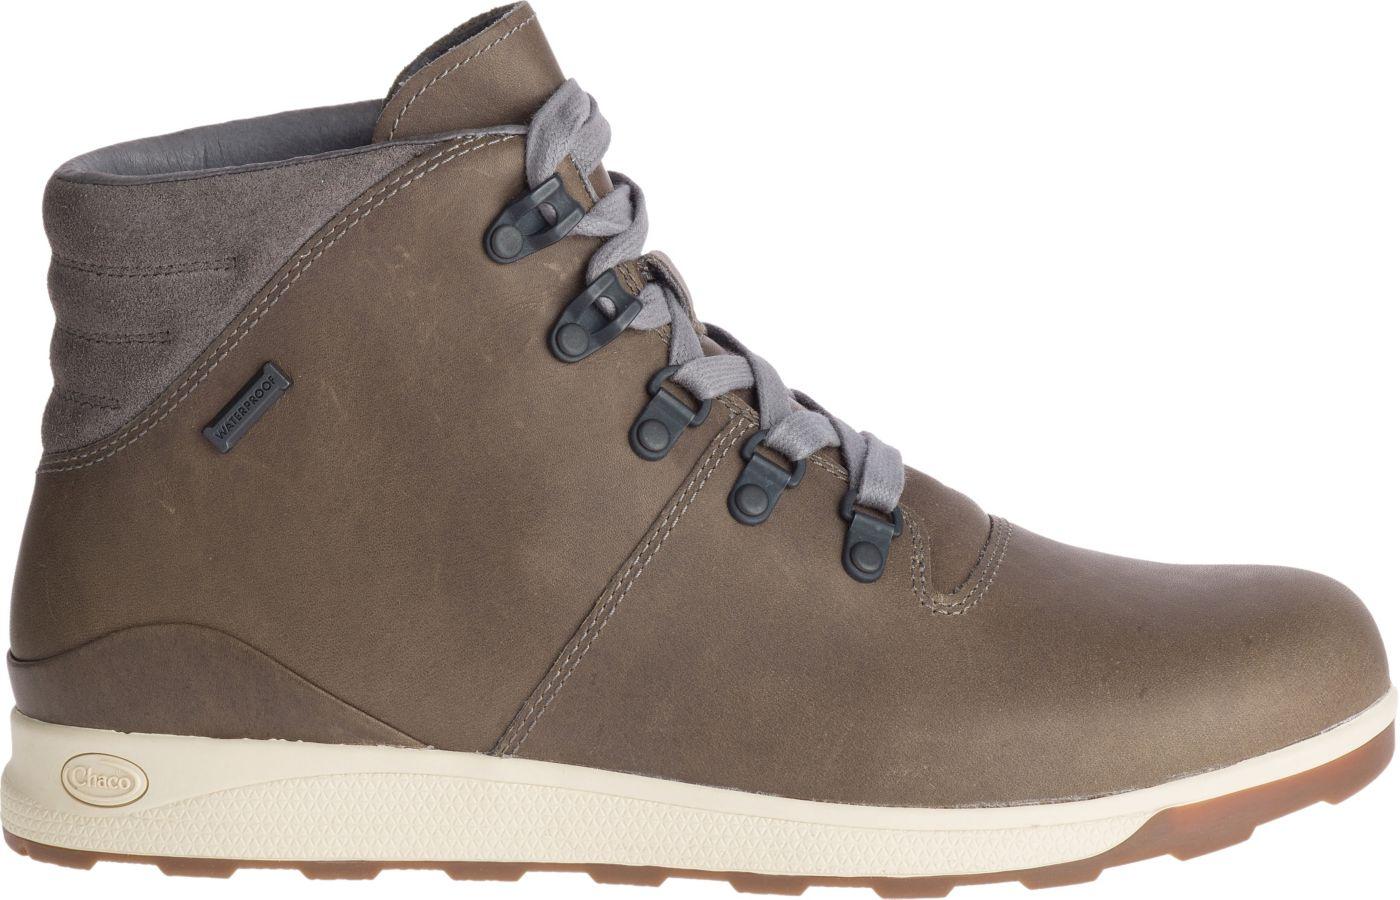 Chaco Men's Frontier Waterproof Casual Boots